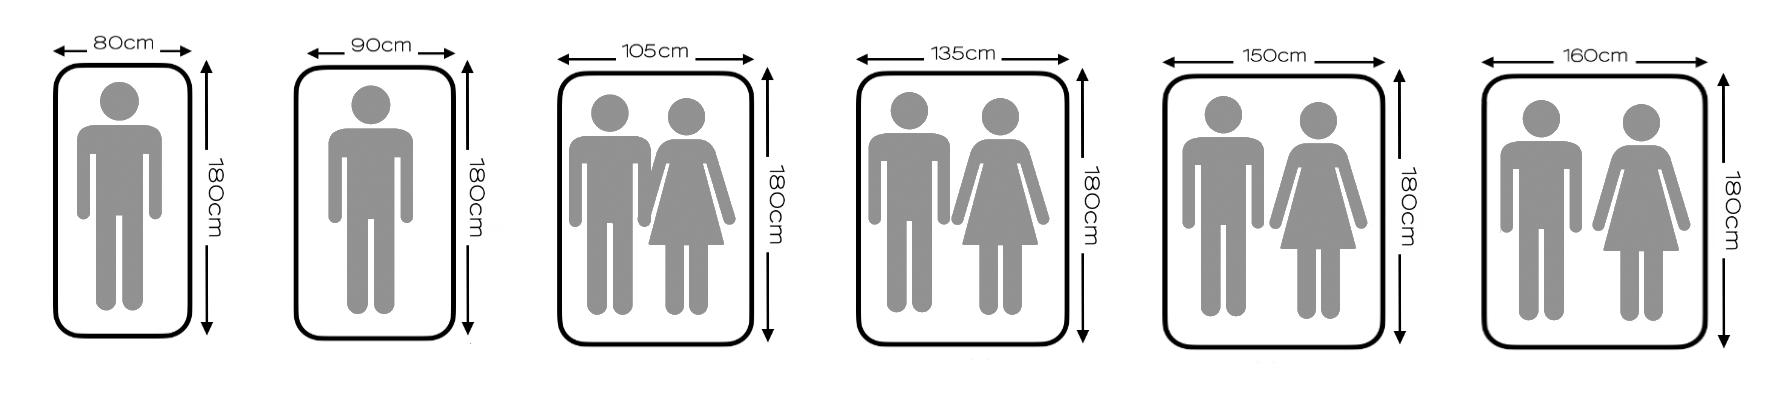 medidas somier dunlopillo_180cm